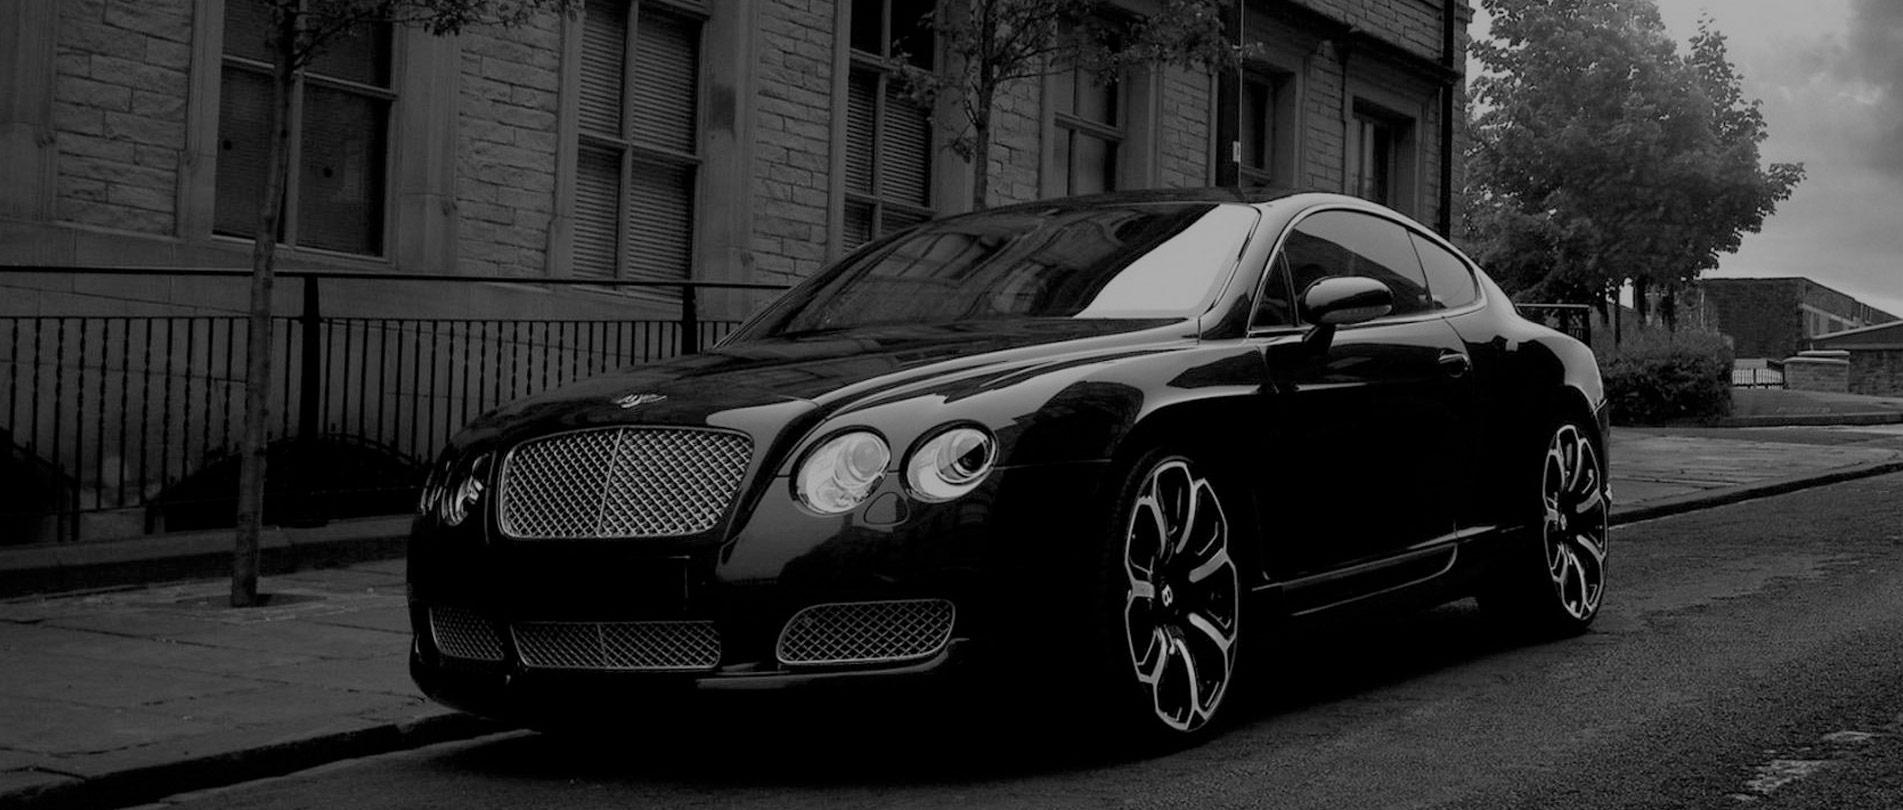 Prestige Cars Sheffield, TVR Specialist, Prestige and